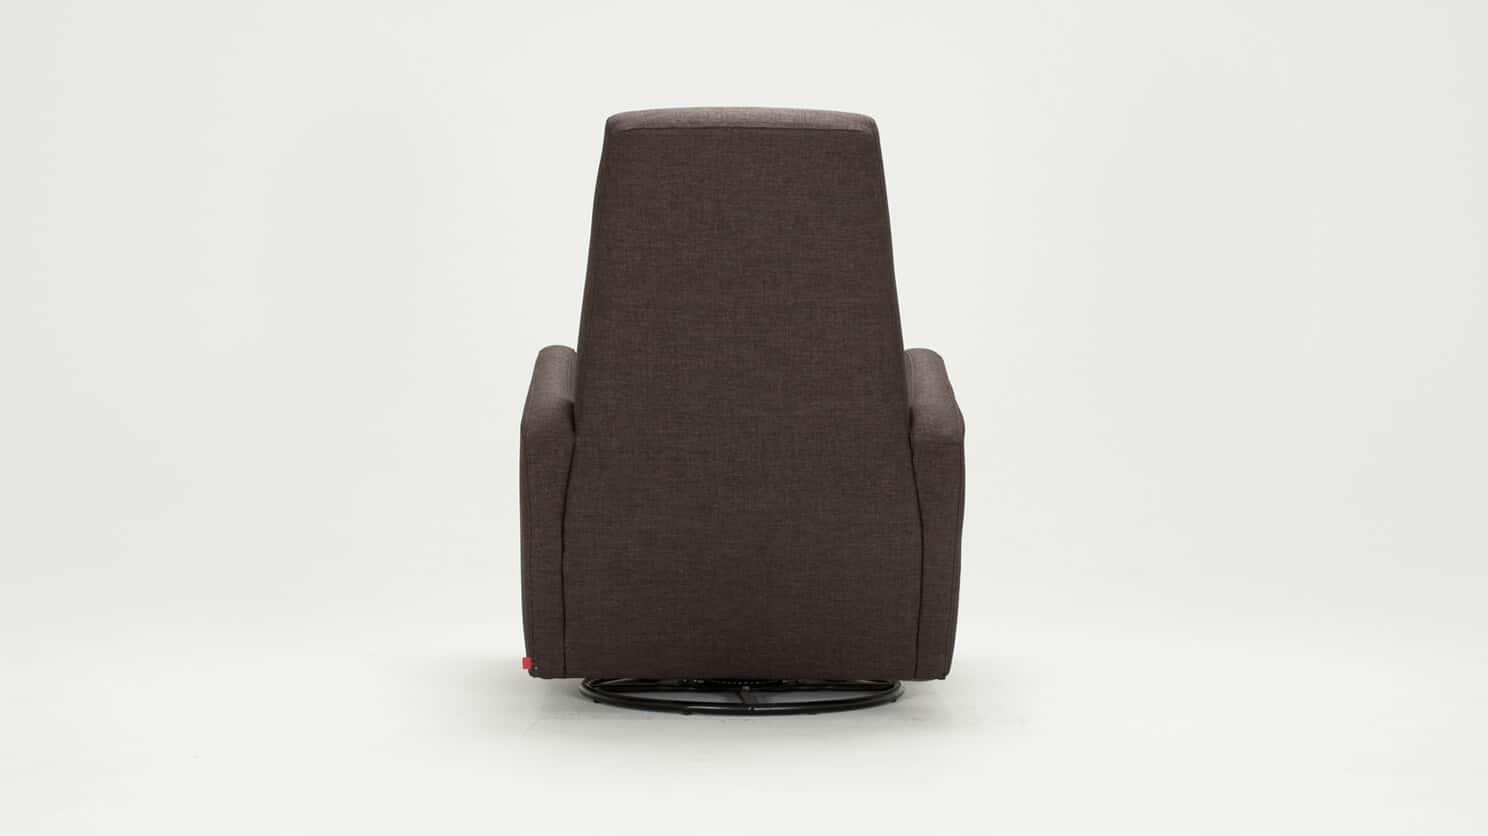 30073 71 8 chairs karbon swivel chair polo slate back 01